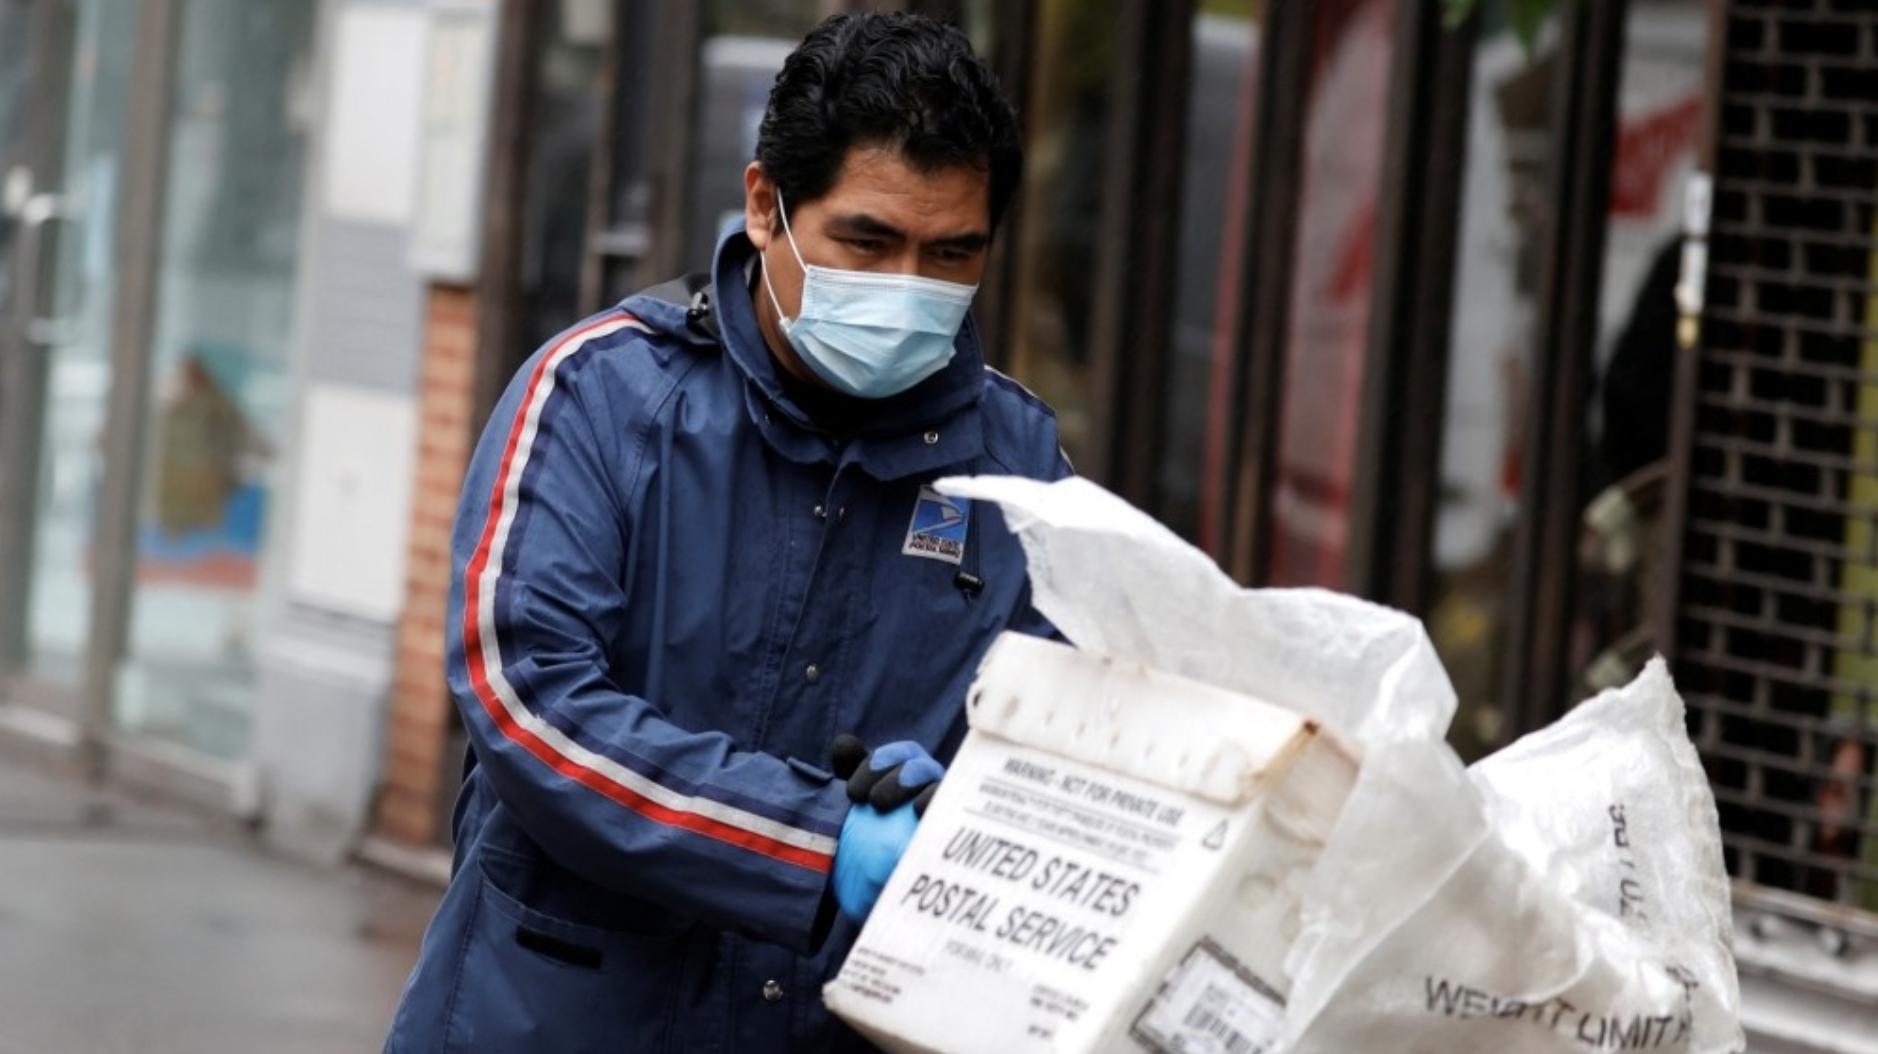 Postal worker wearing a mask